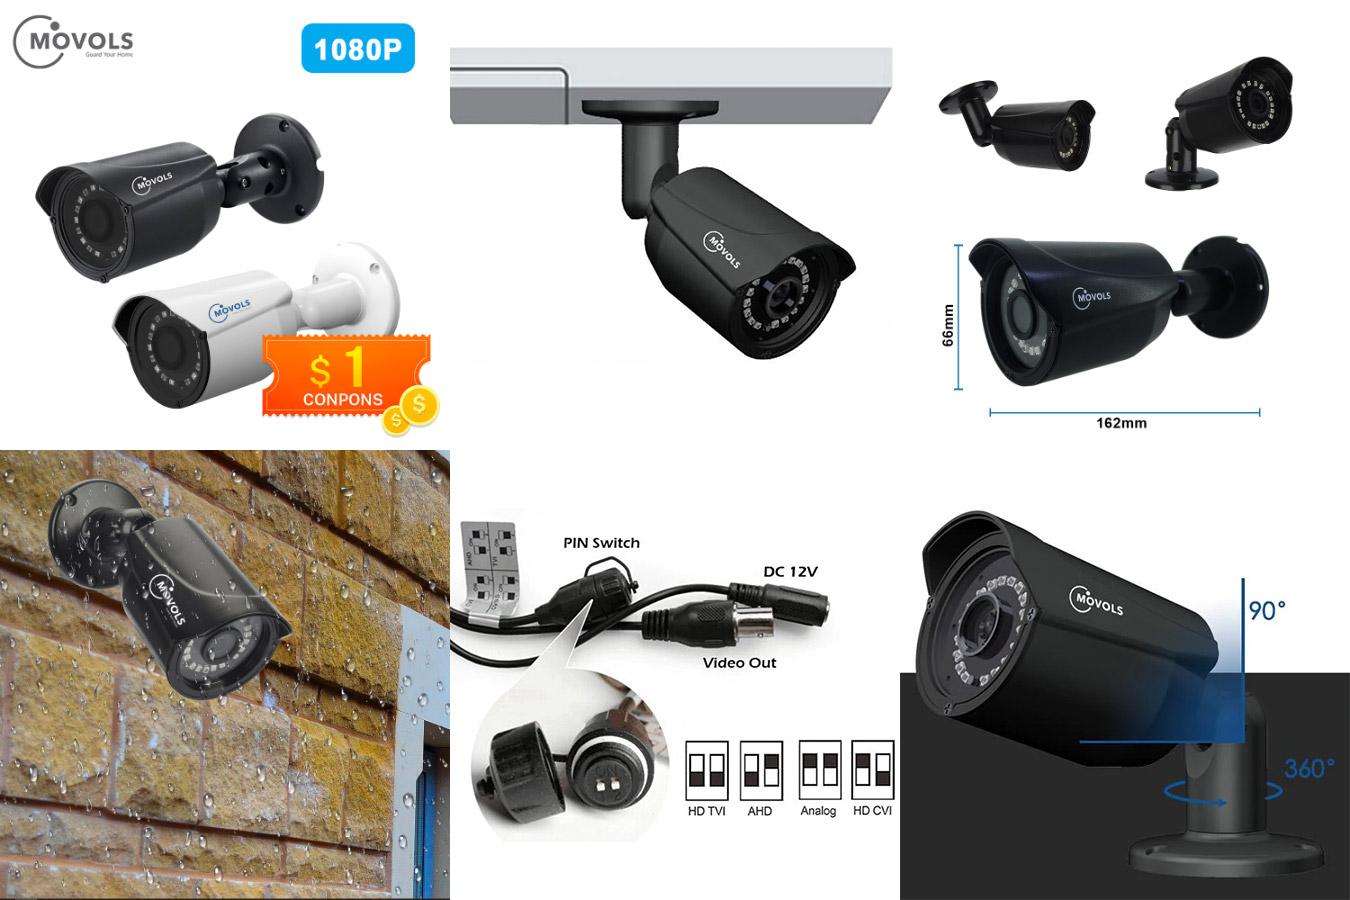 Наружная камера безопасности Movols